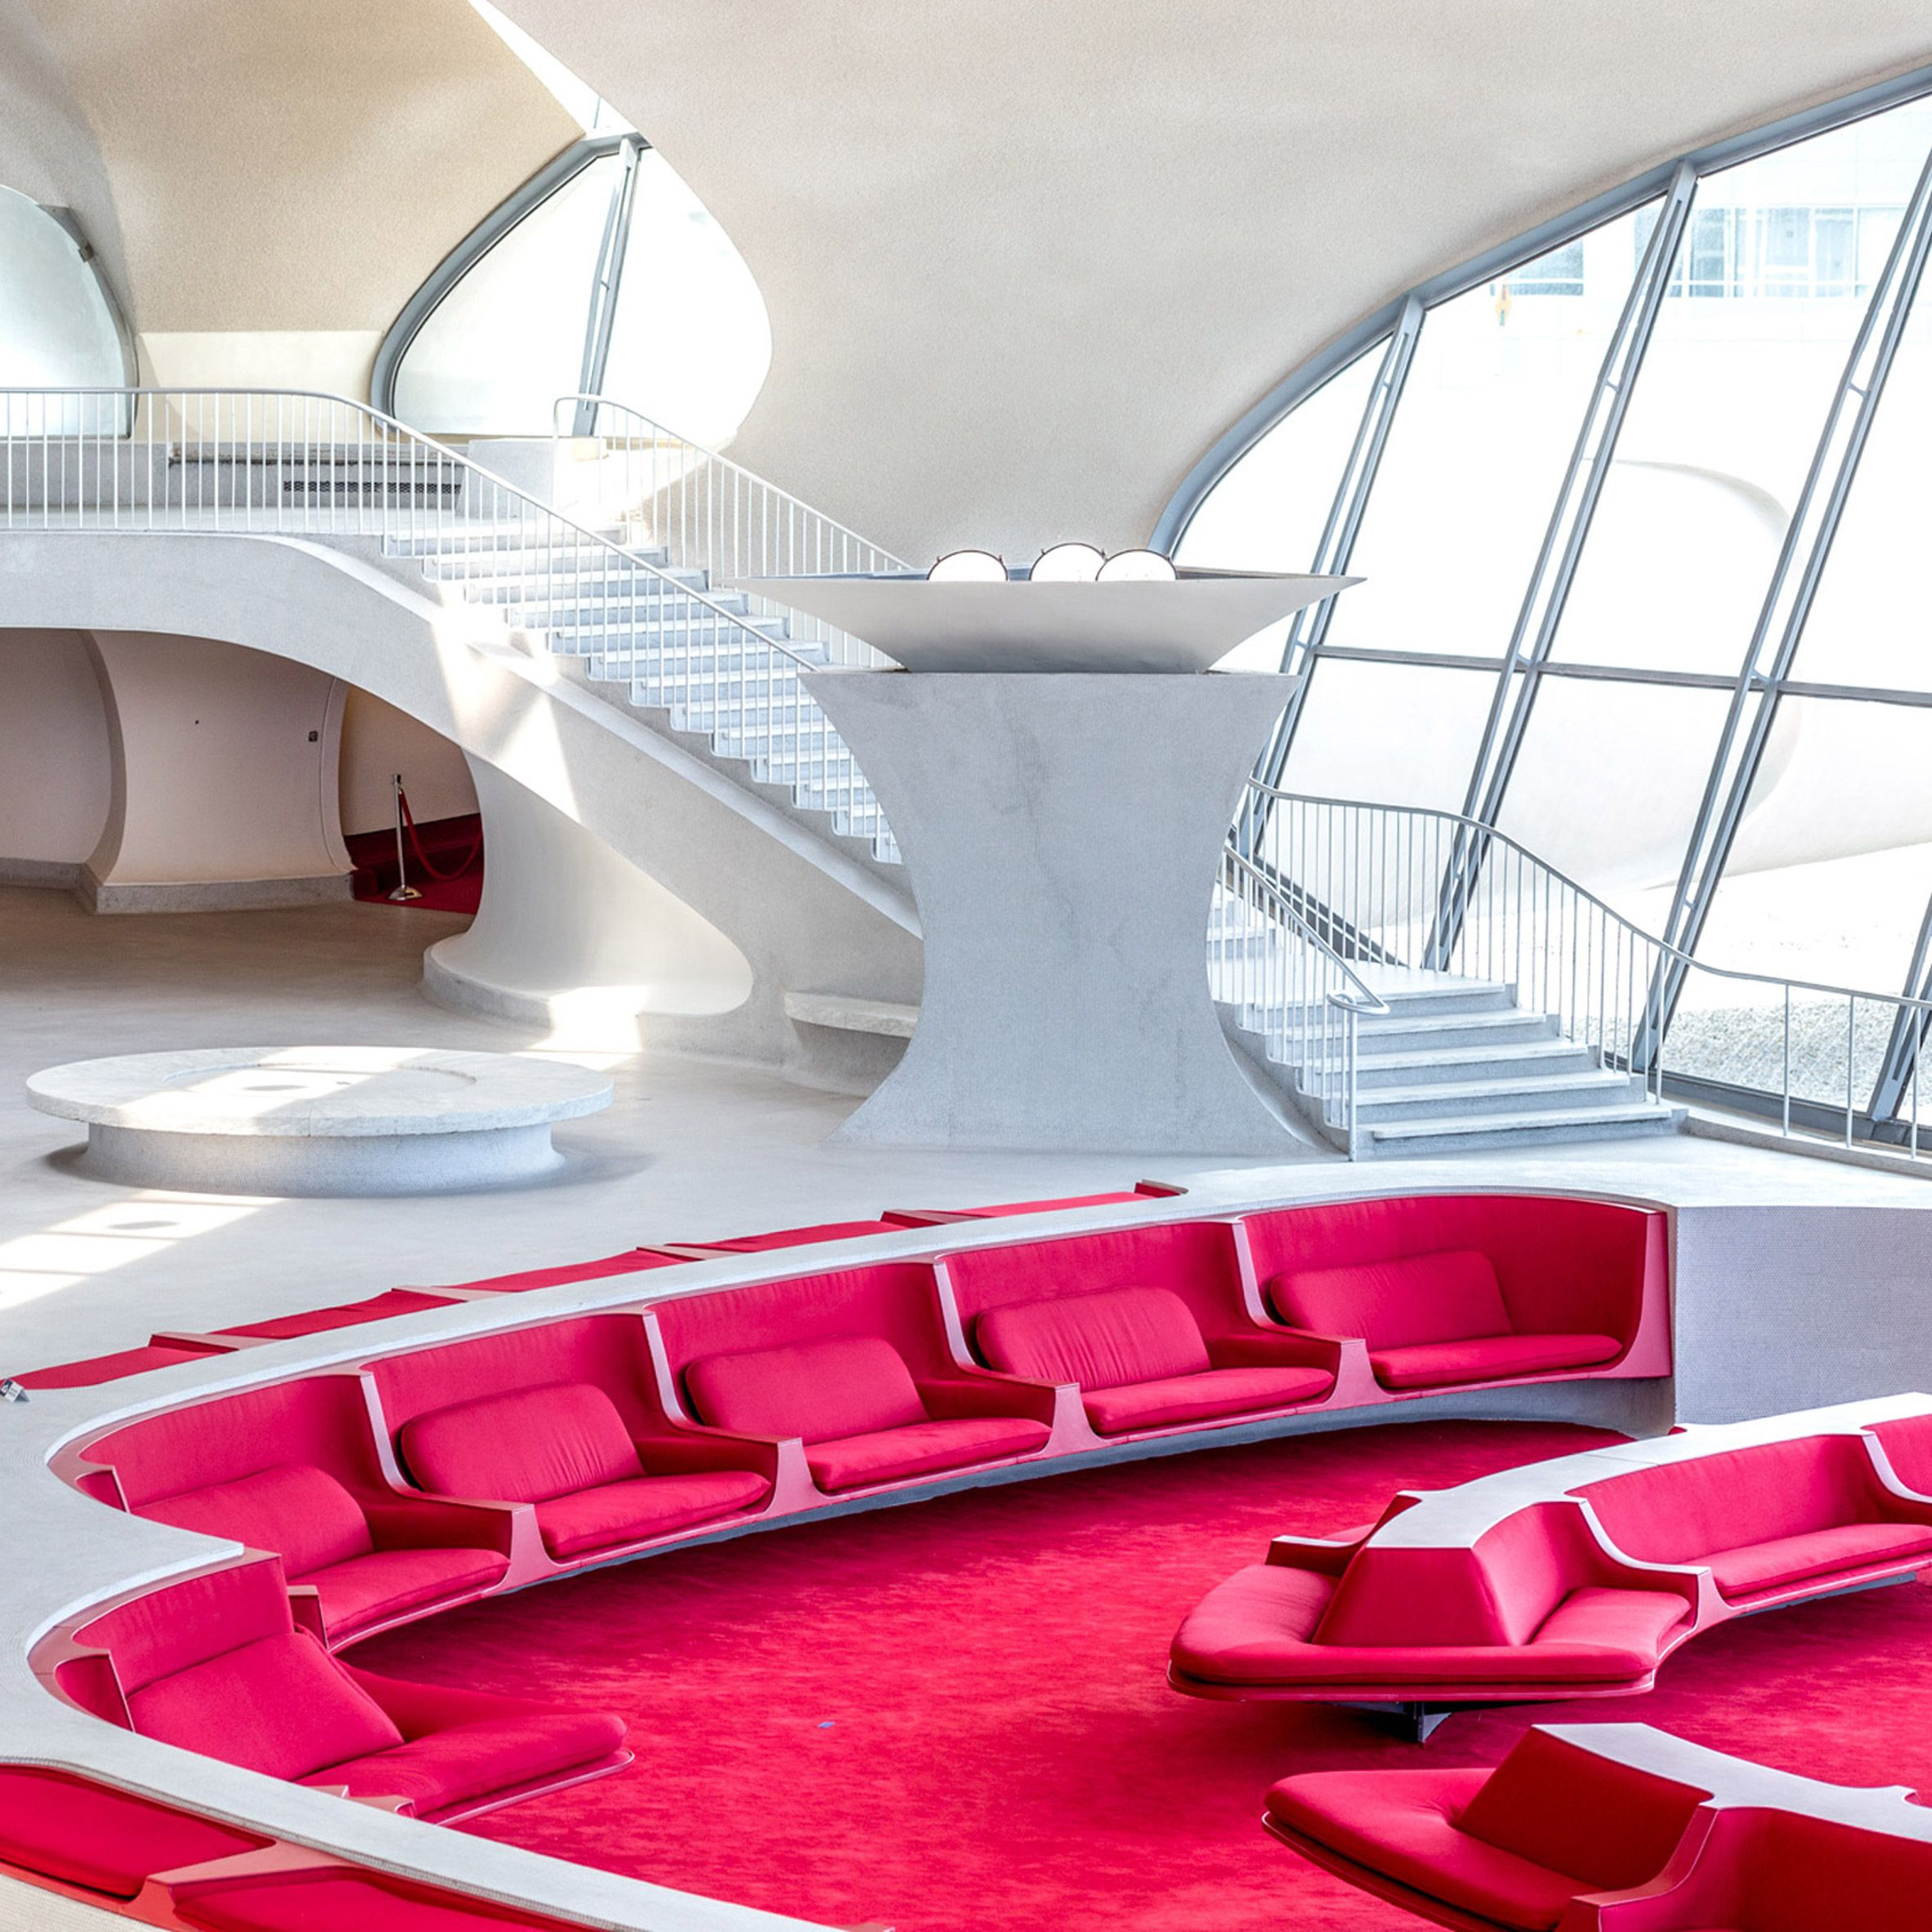 TWA Hotel Inside Eero Saarinen's JFK Airport Terminal